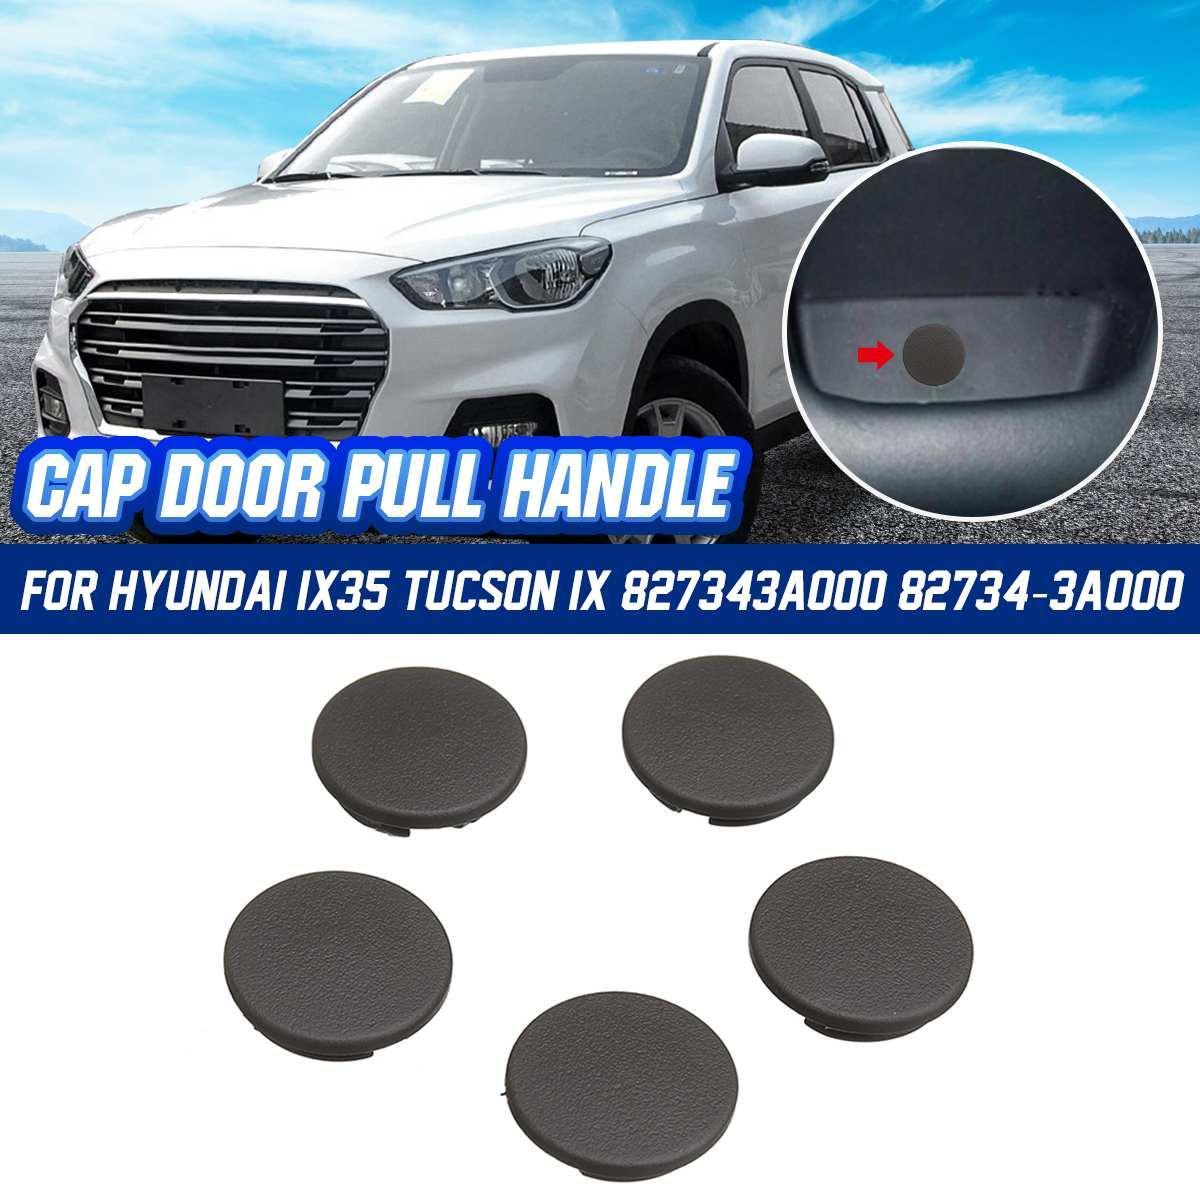 5Pcs Auto Innen Tür stopper Kappe Pull Griff 827343A000 82734-3A000 Für Hyundai IX35 Tucson IX